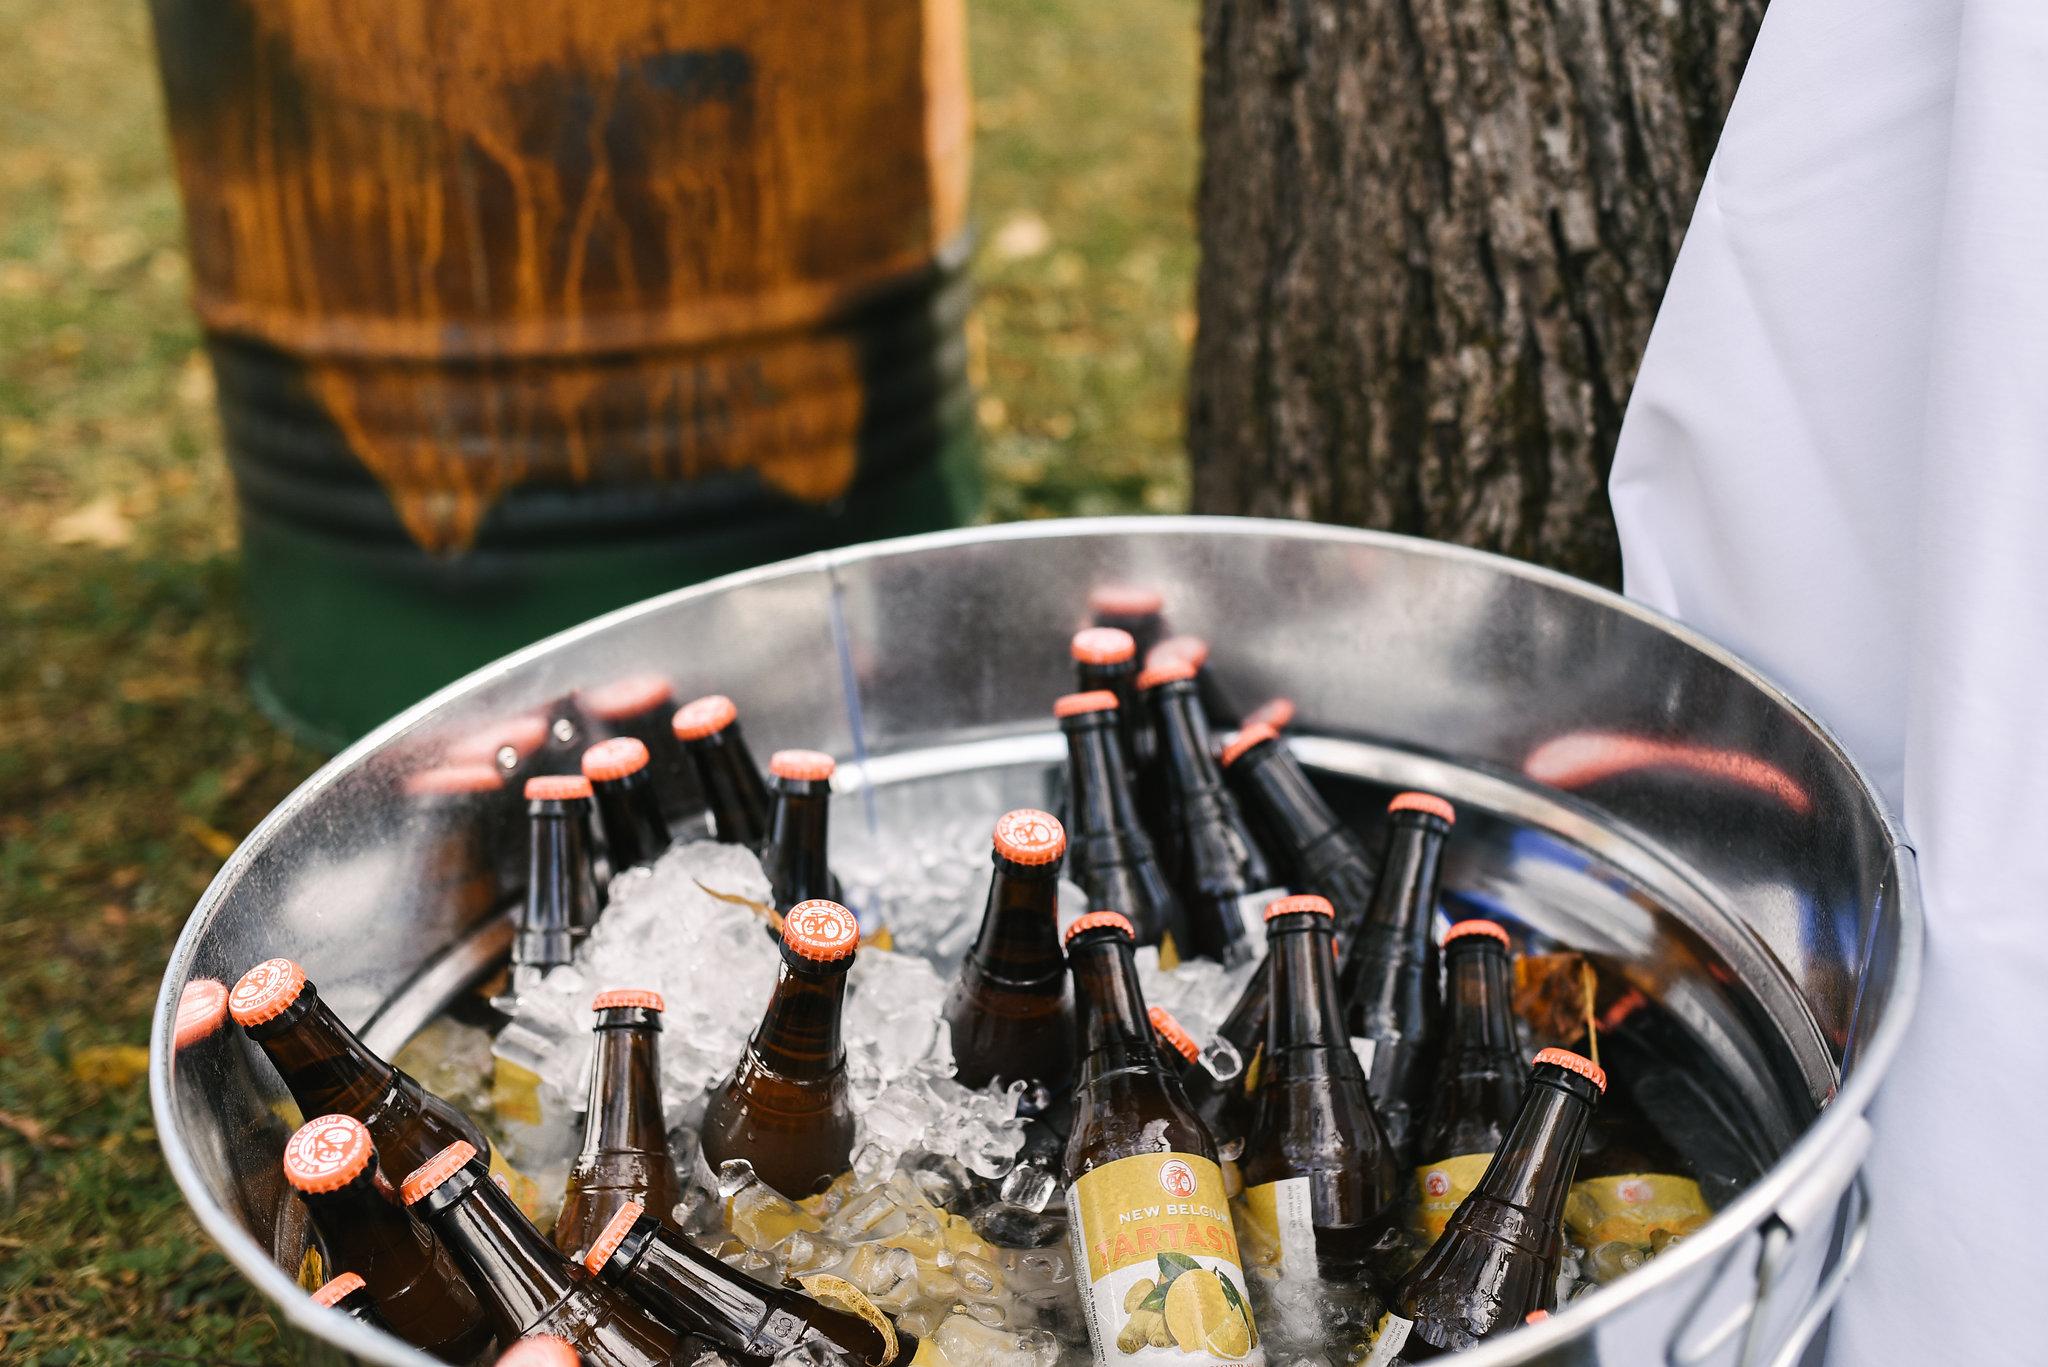 Baltimore, Maryland Wedding Photographer, Backyard Wedding, DIY, Rustic, Casual, Fall Wedding, Woodland, Bucket of Local Craft Beer at Reception